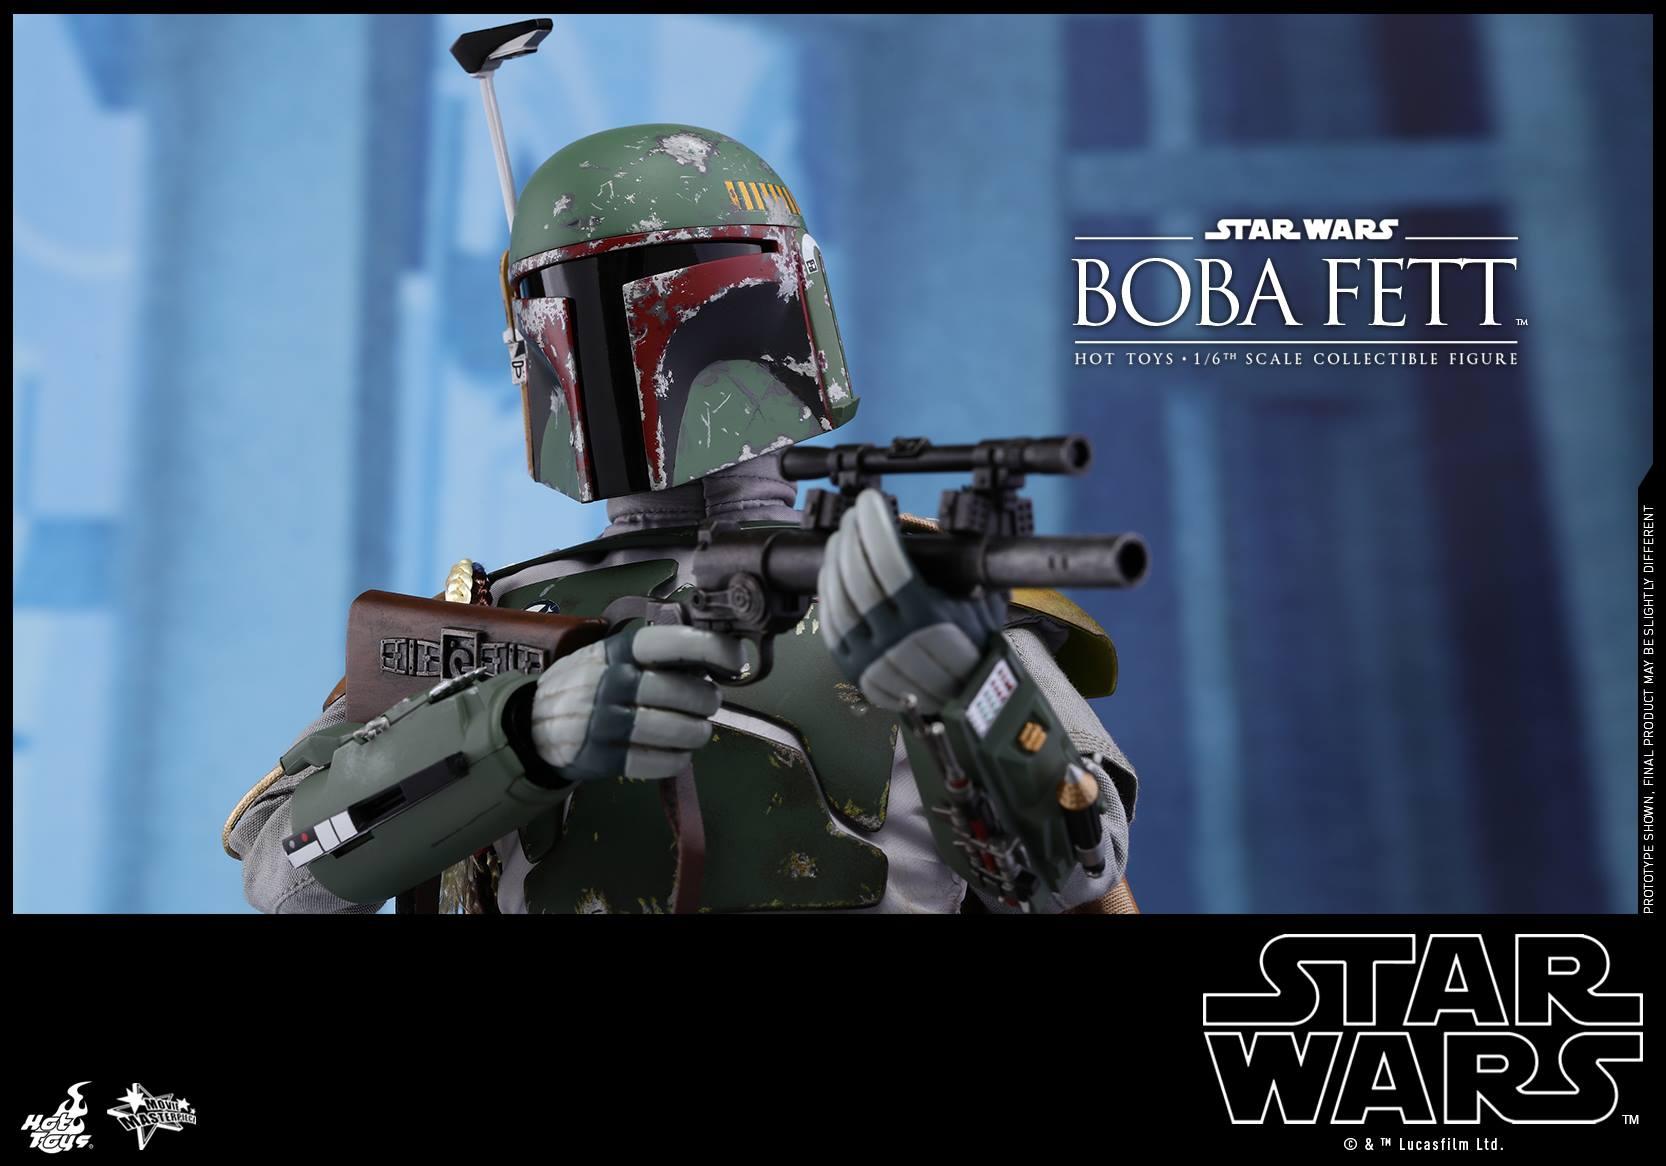 Hot-Toys-Empre-Strikes-Back-Boba-Fett-008